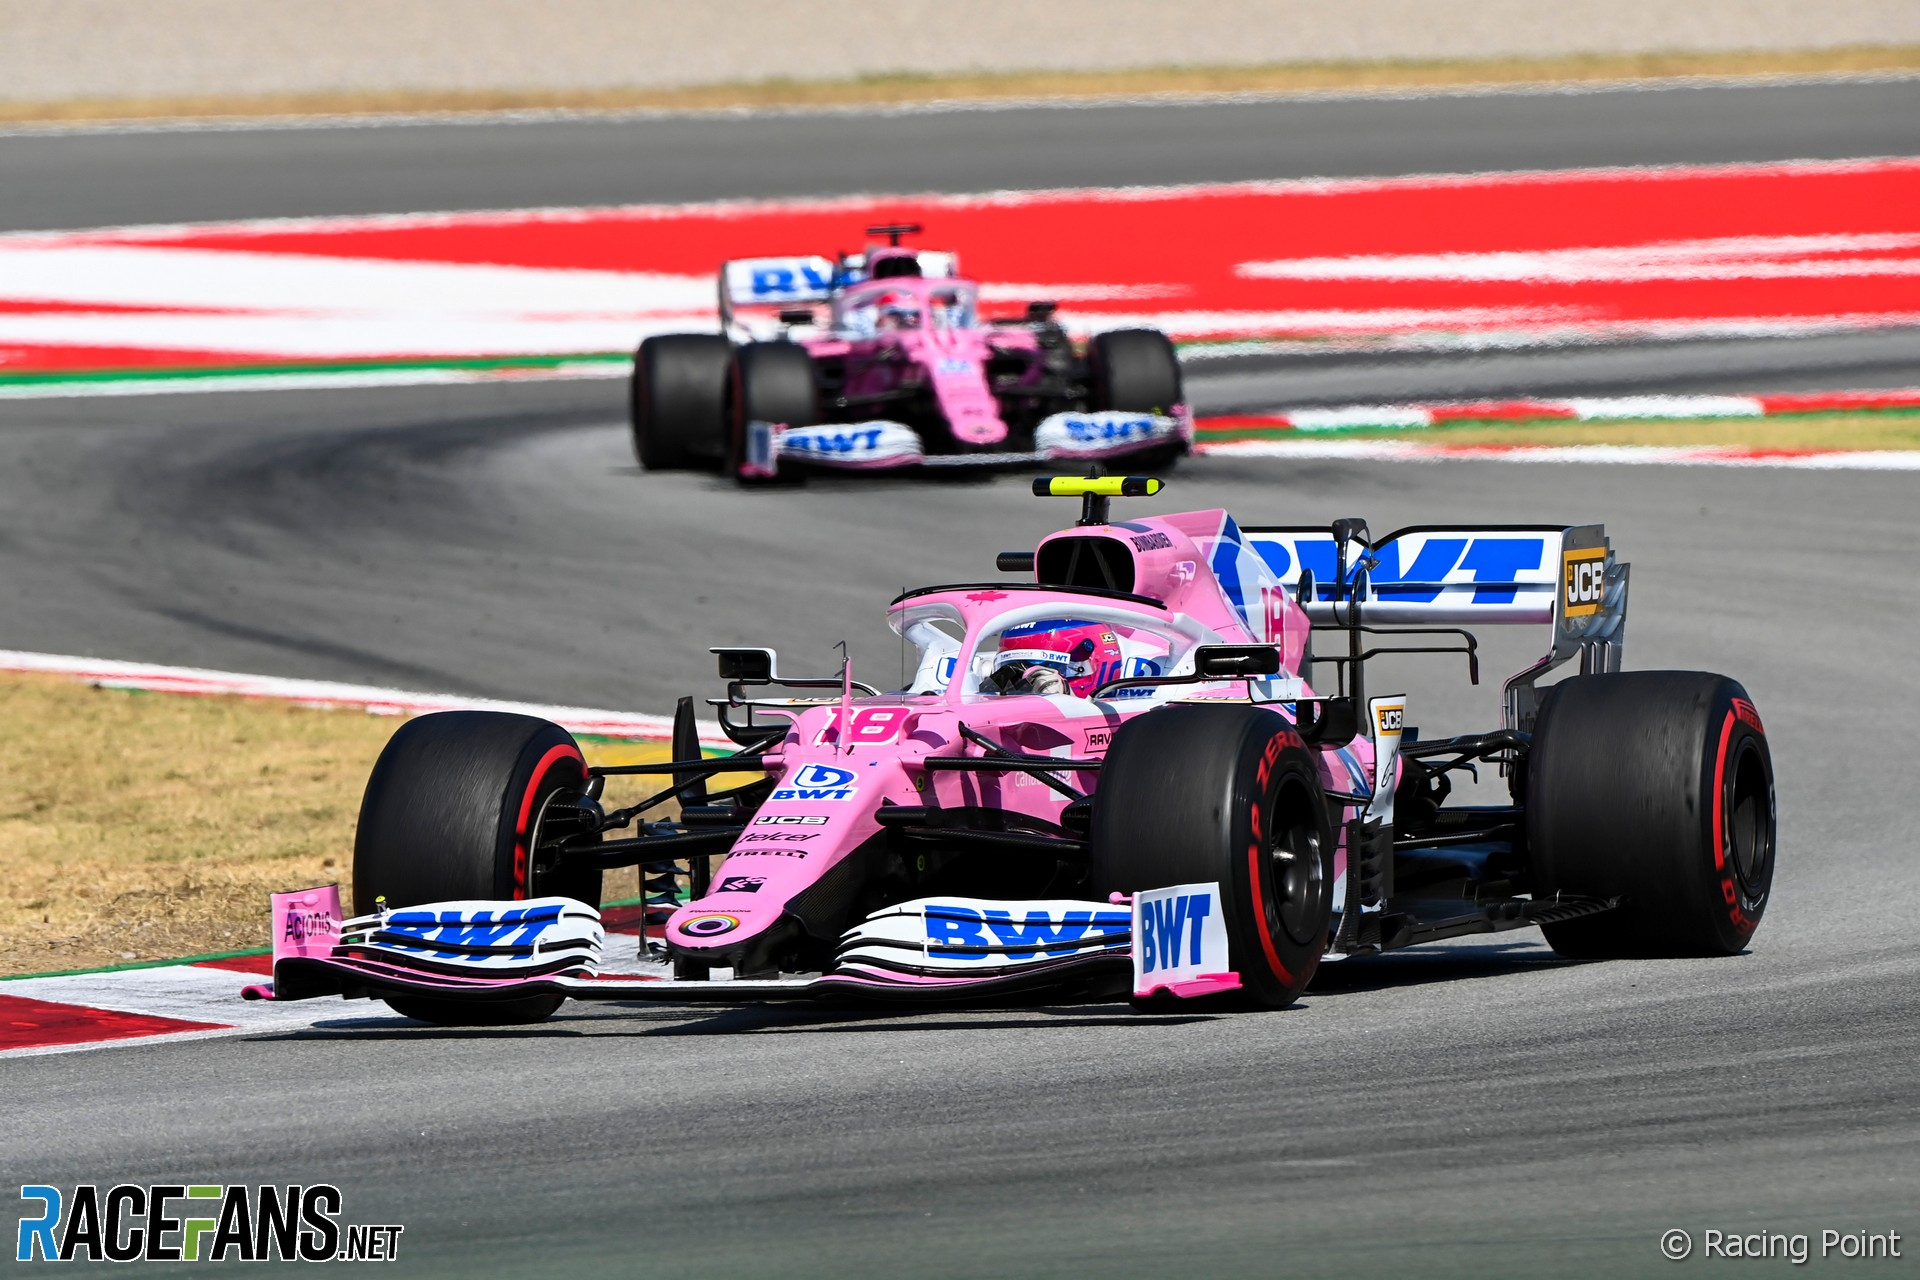 Lance Stroll, Racing Point, Circuit de Catalunya, 2020